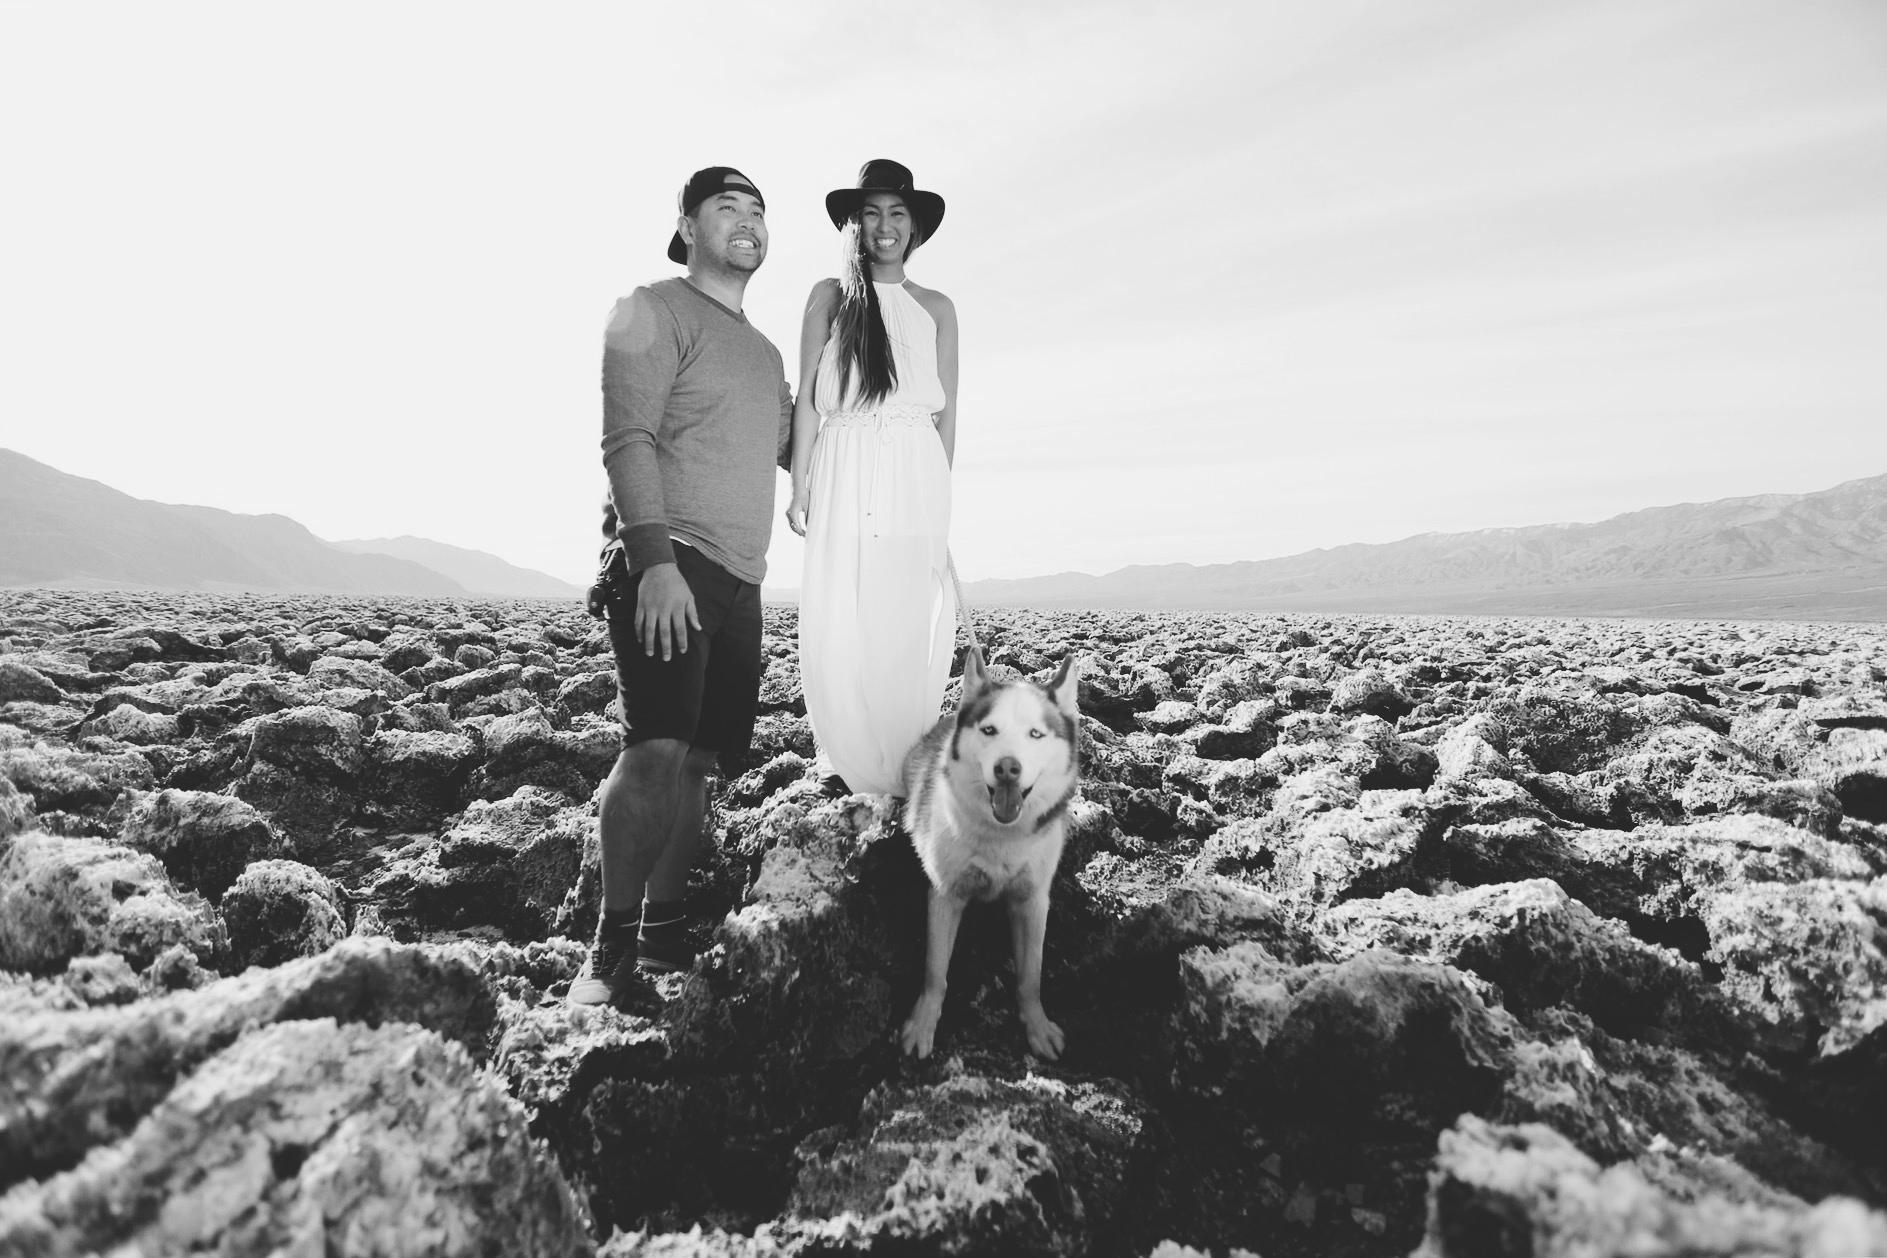 Death Valley 2015 (47 of 82).JPG